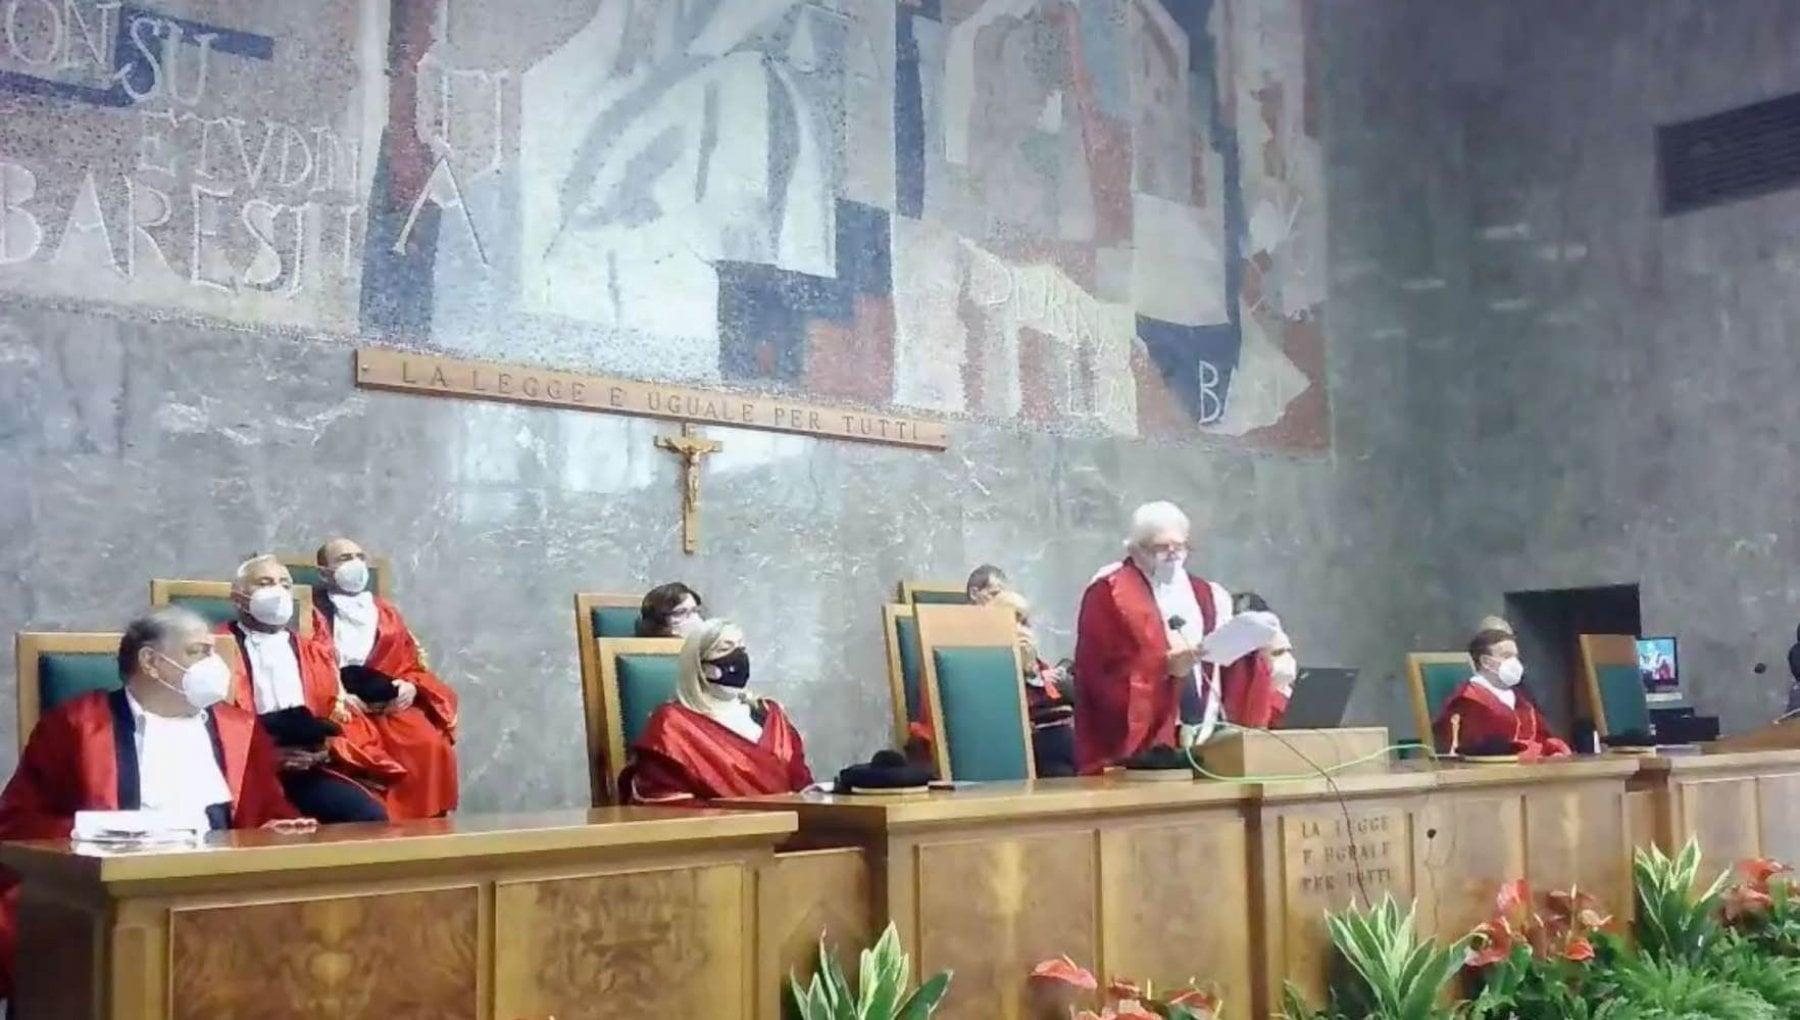 222027768 7af14b47 6f18 4a5e a4e1 41497ab87af1 - Il paradosso della Giustizia in Puglia: udienze in videoconferenza, ma tribunali senza Internet